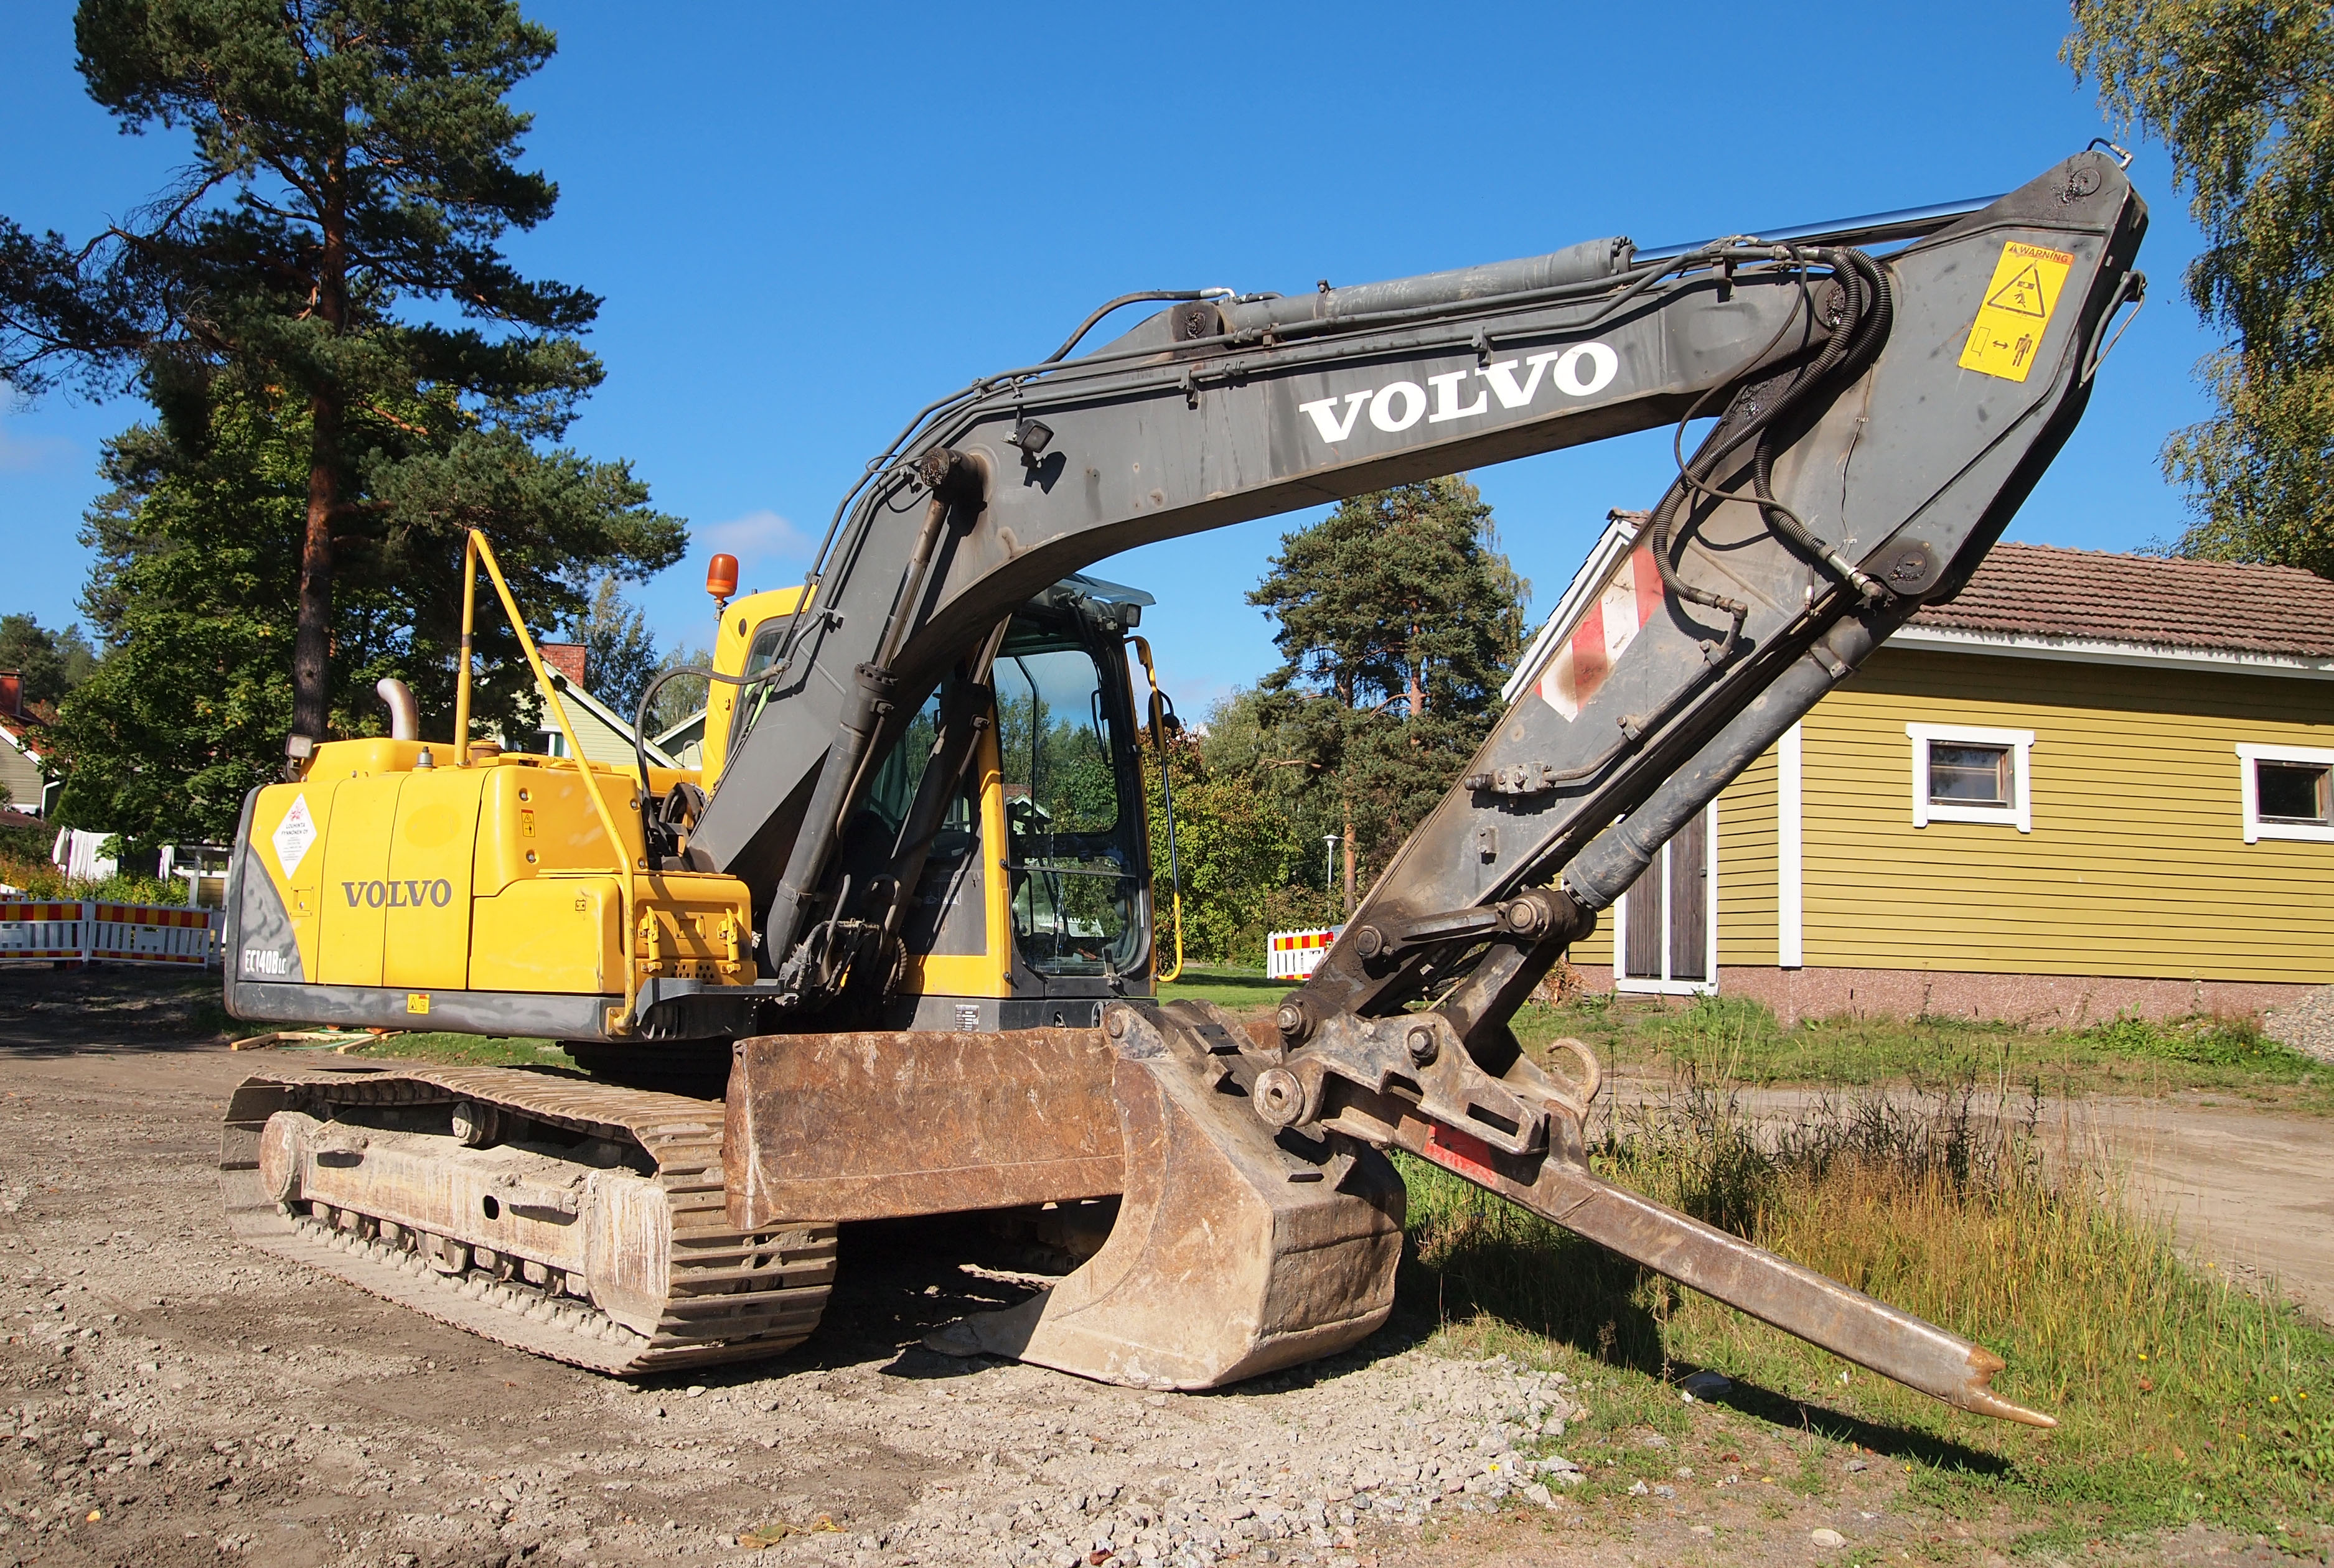 File:Volvo excavator 3 jpg - Wikimedia Commons